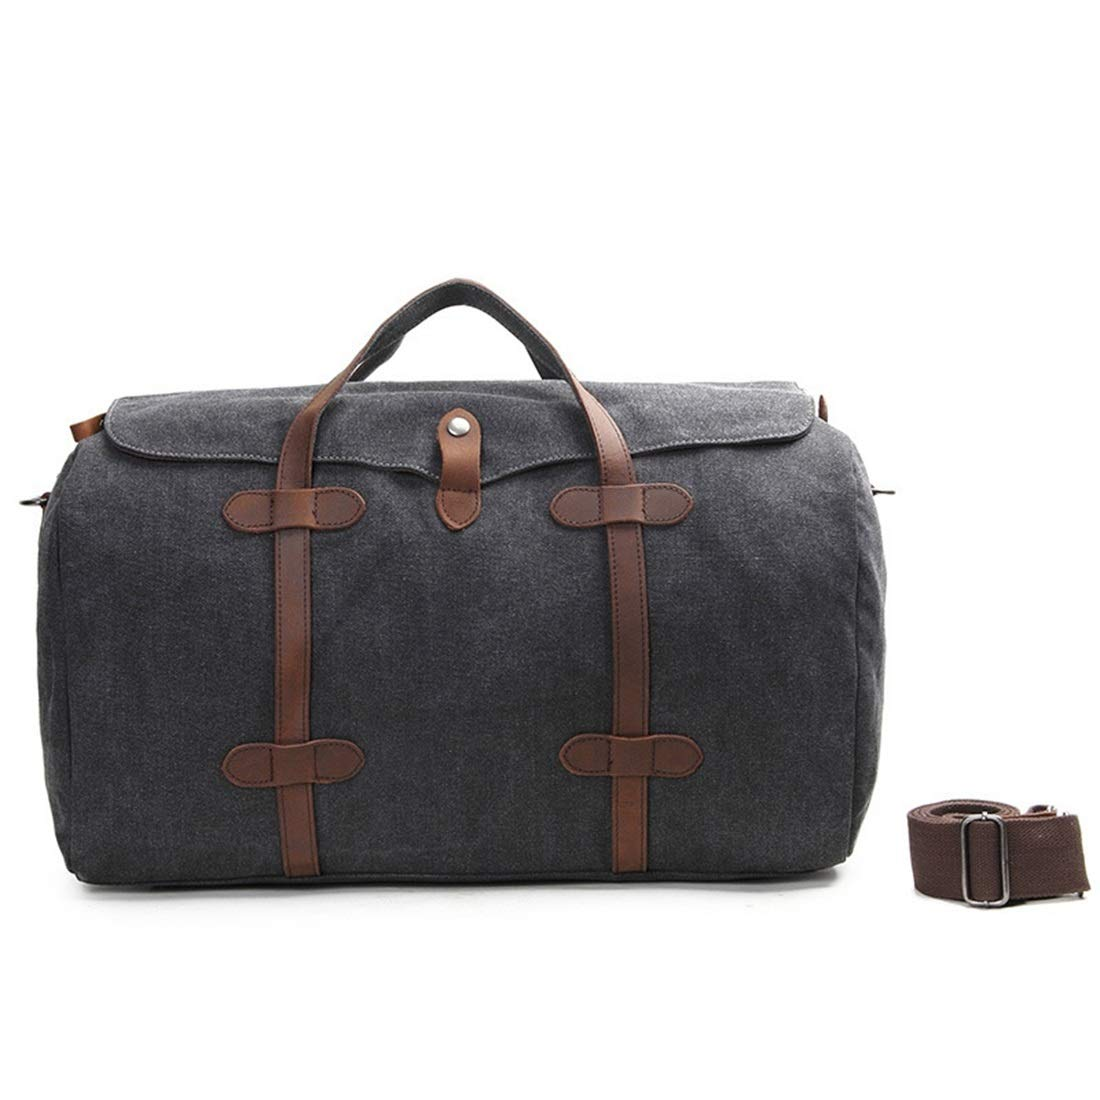 Color : Dark Gray Carriemeow Canvas Bag Canvas Messenger Bag Crazy Horse Travel Outdoor Fitness Men Portable Manual Travel Bag